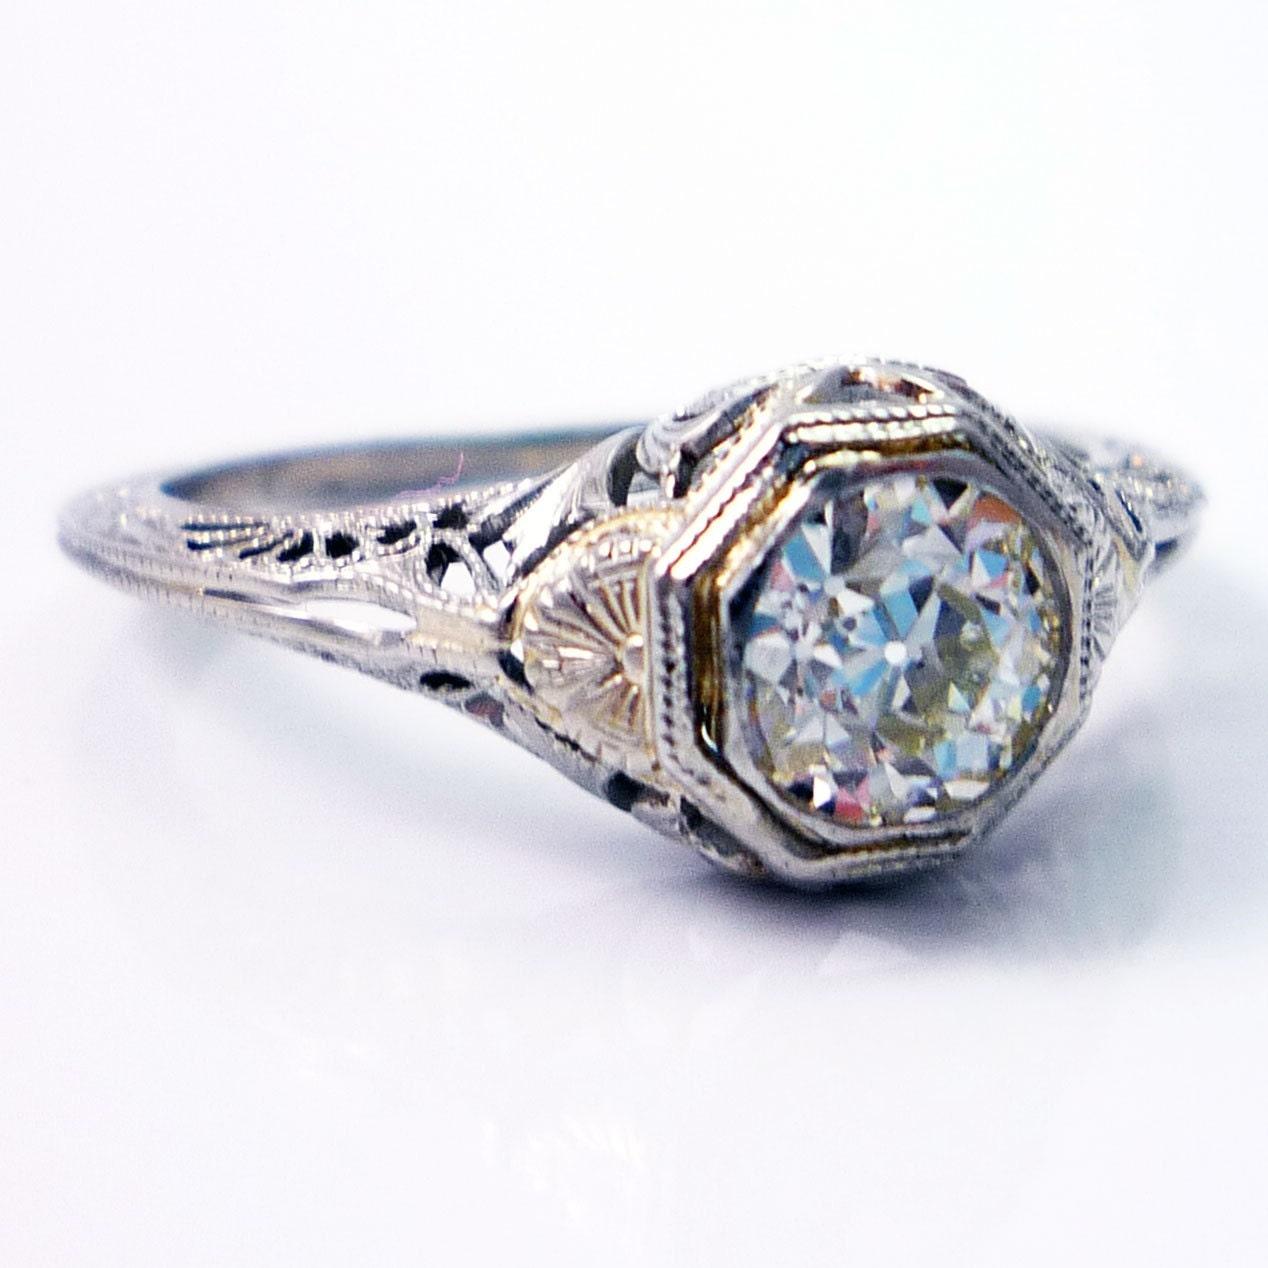 18k Antique Art Deco European Cut Diamond Filigree Engagement